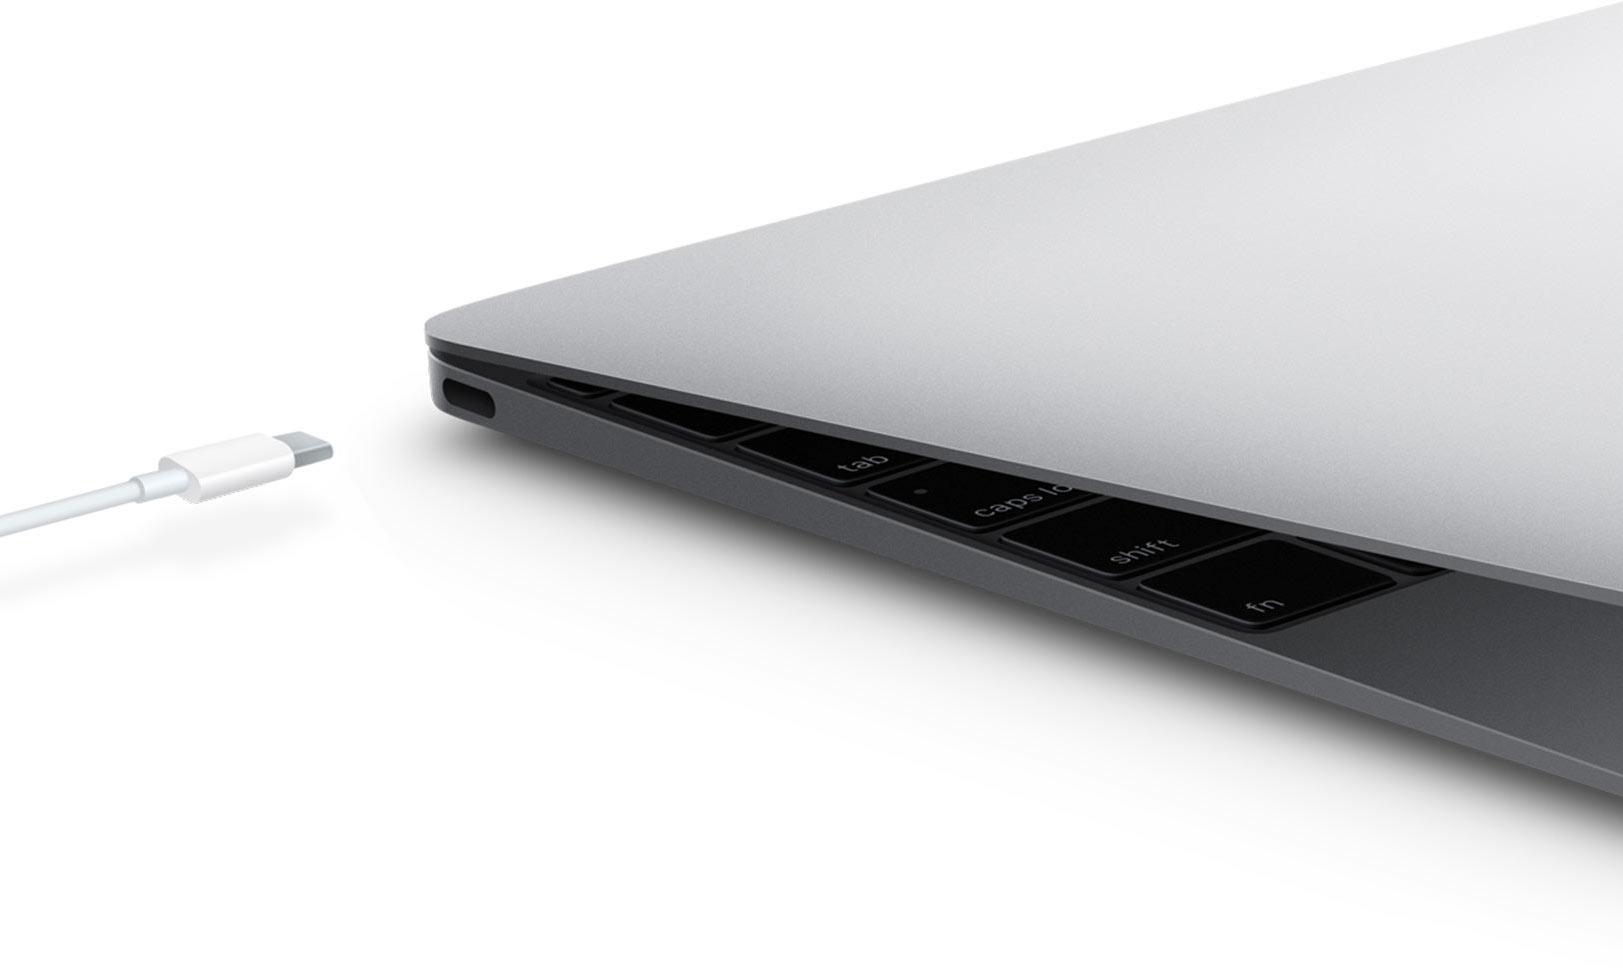 macbook-usb-c-cable